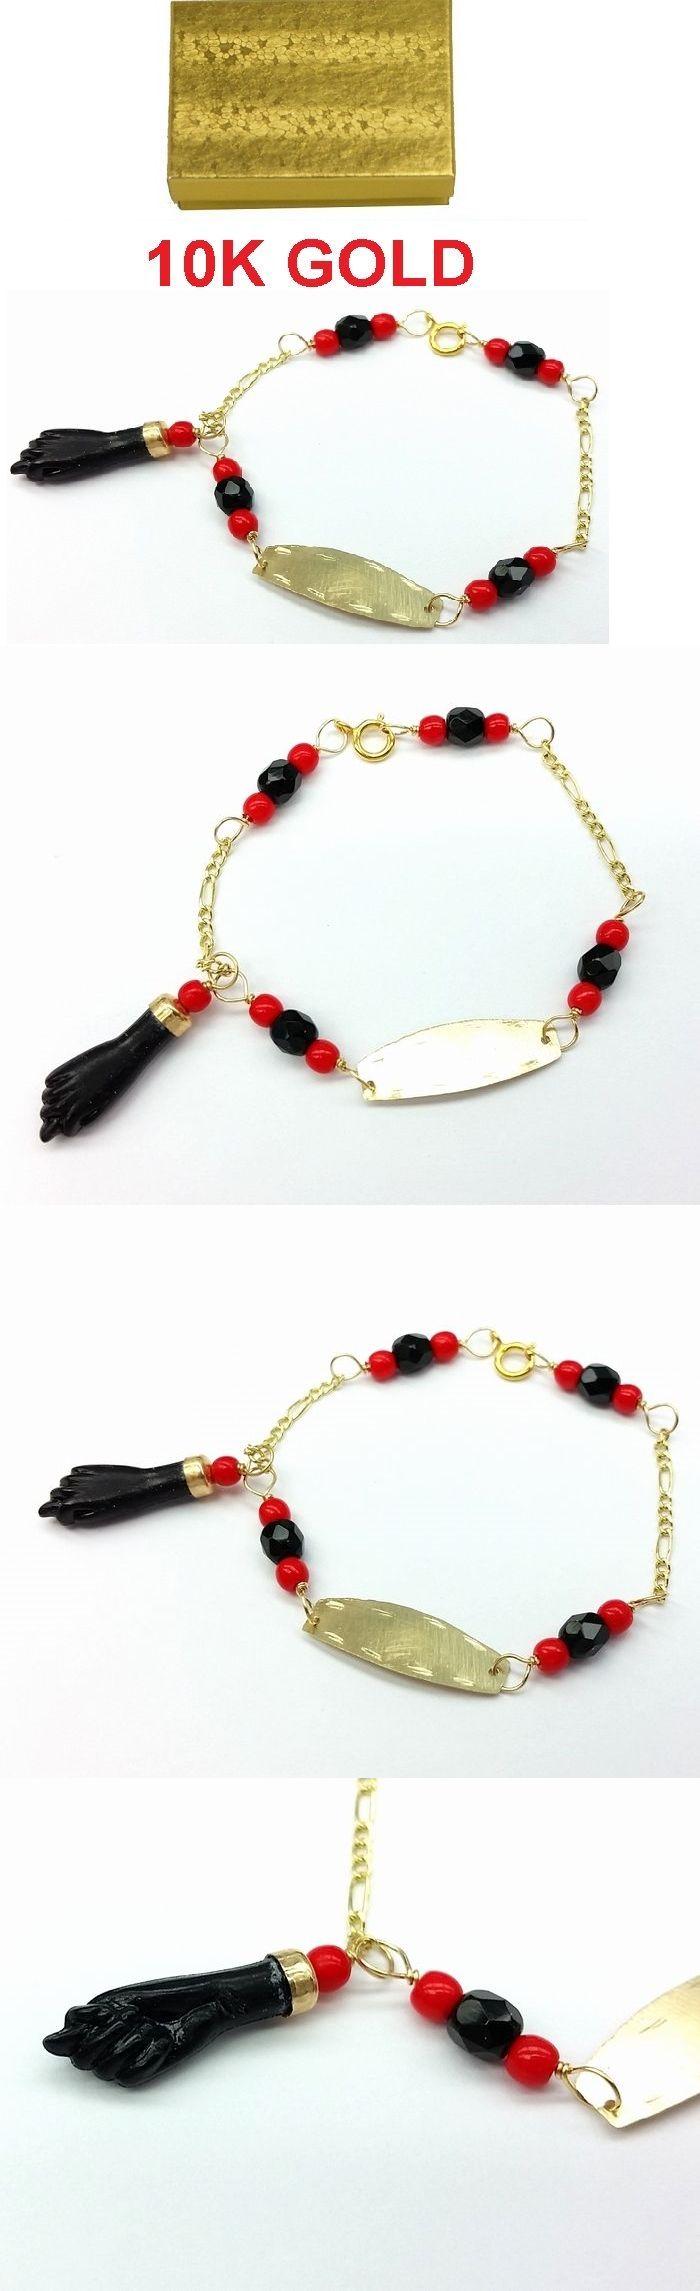 17 ideas about baby bracelet on baby jewelry